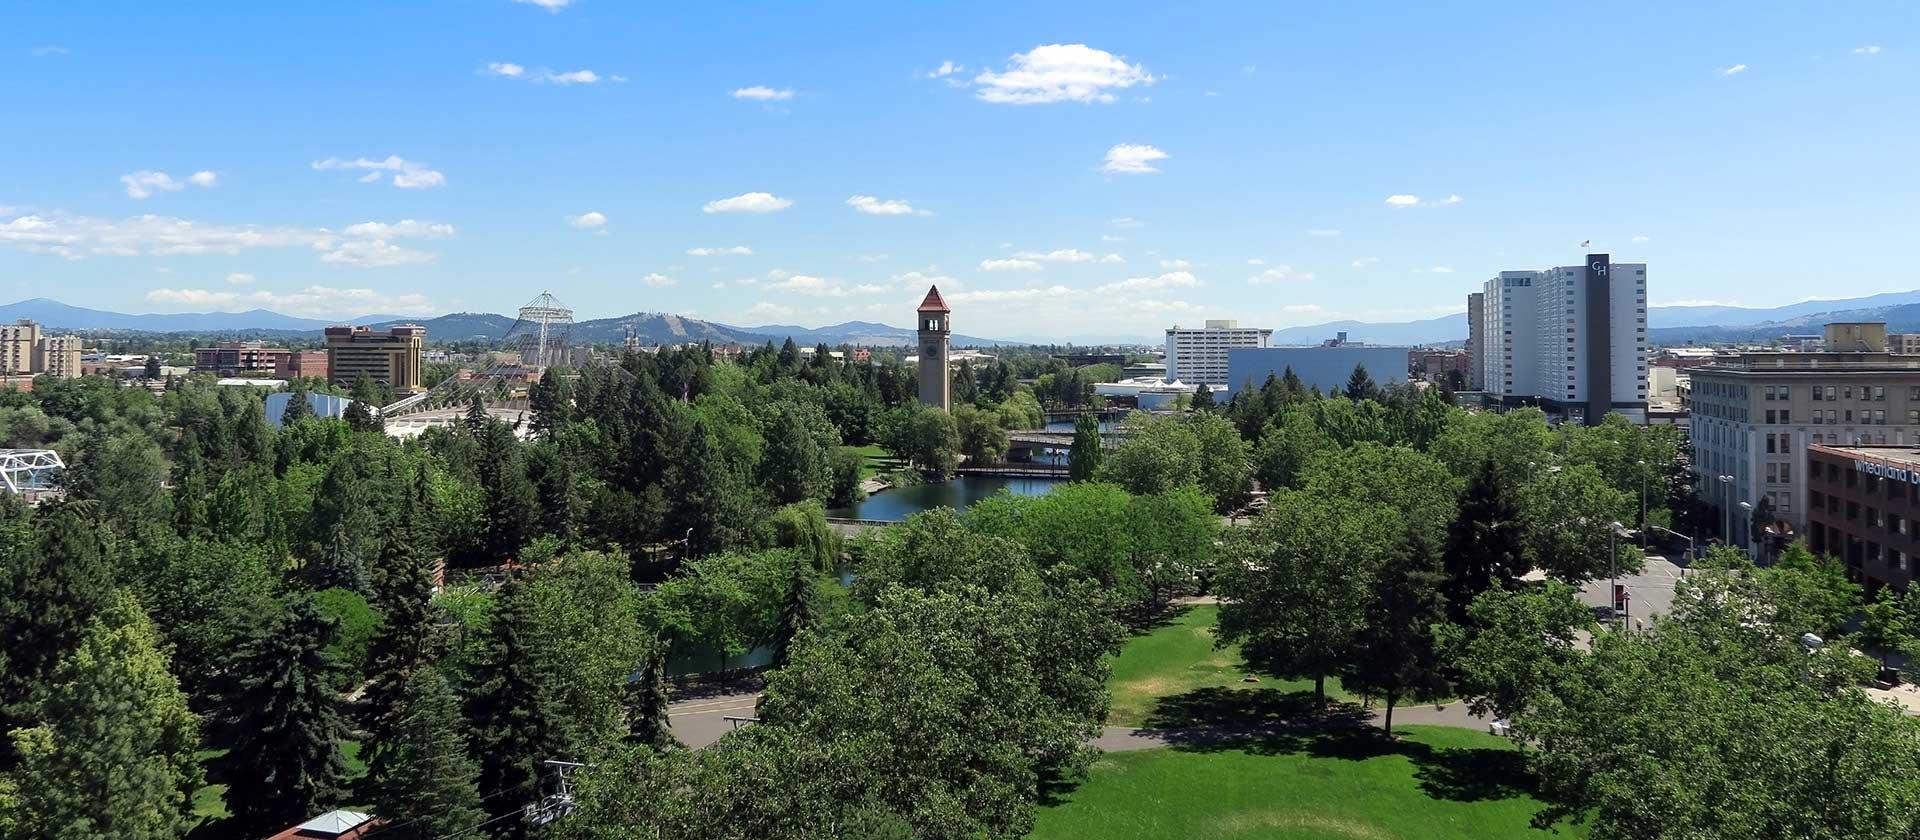 Doubletree Hotel Spokane Wa City Center